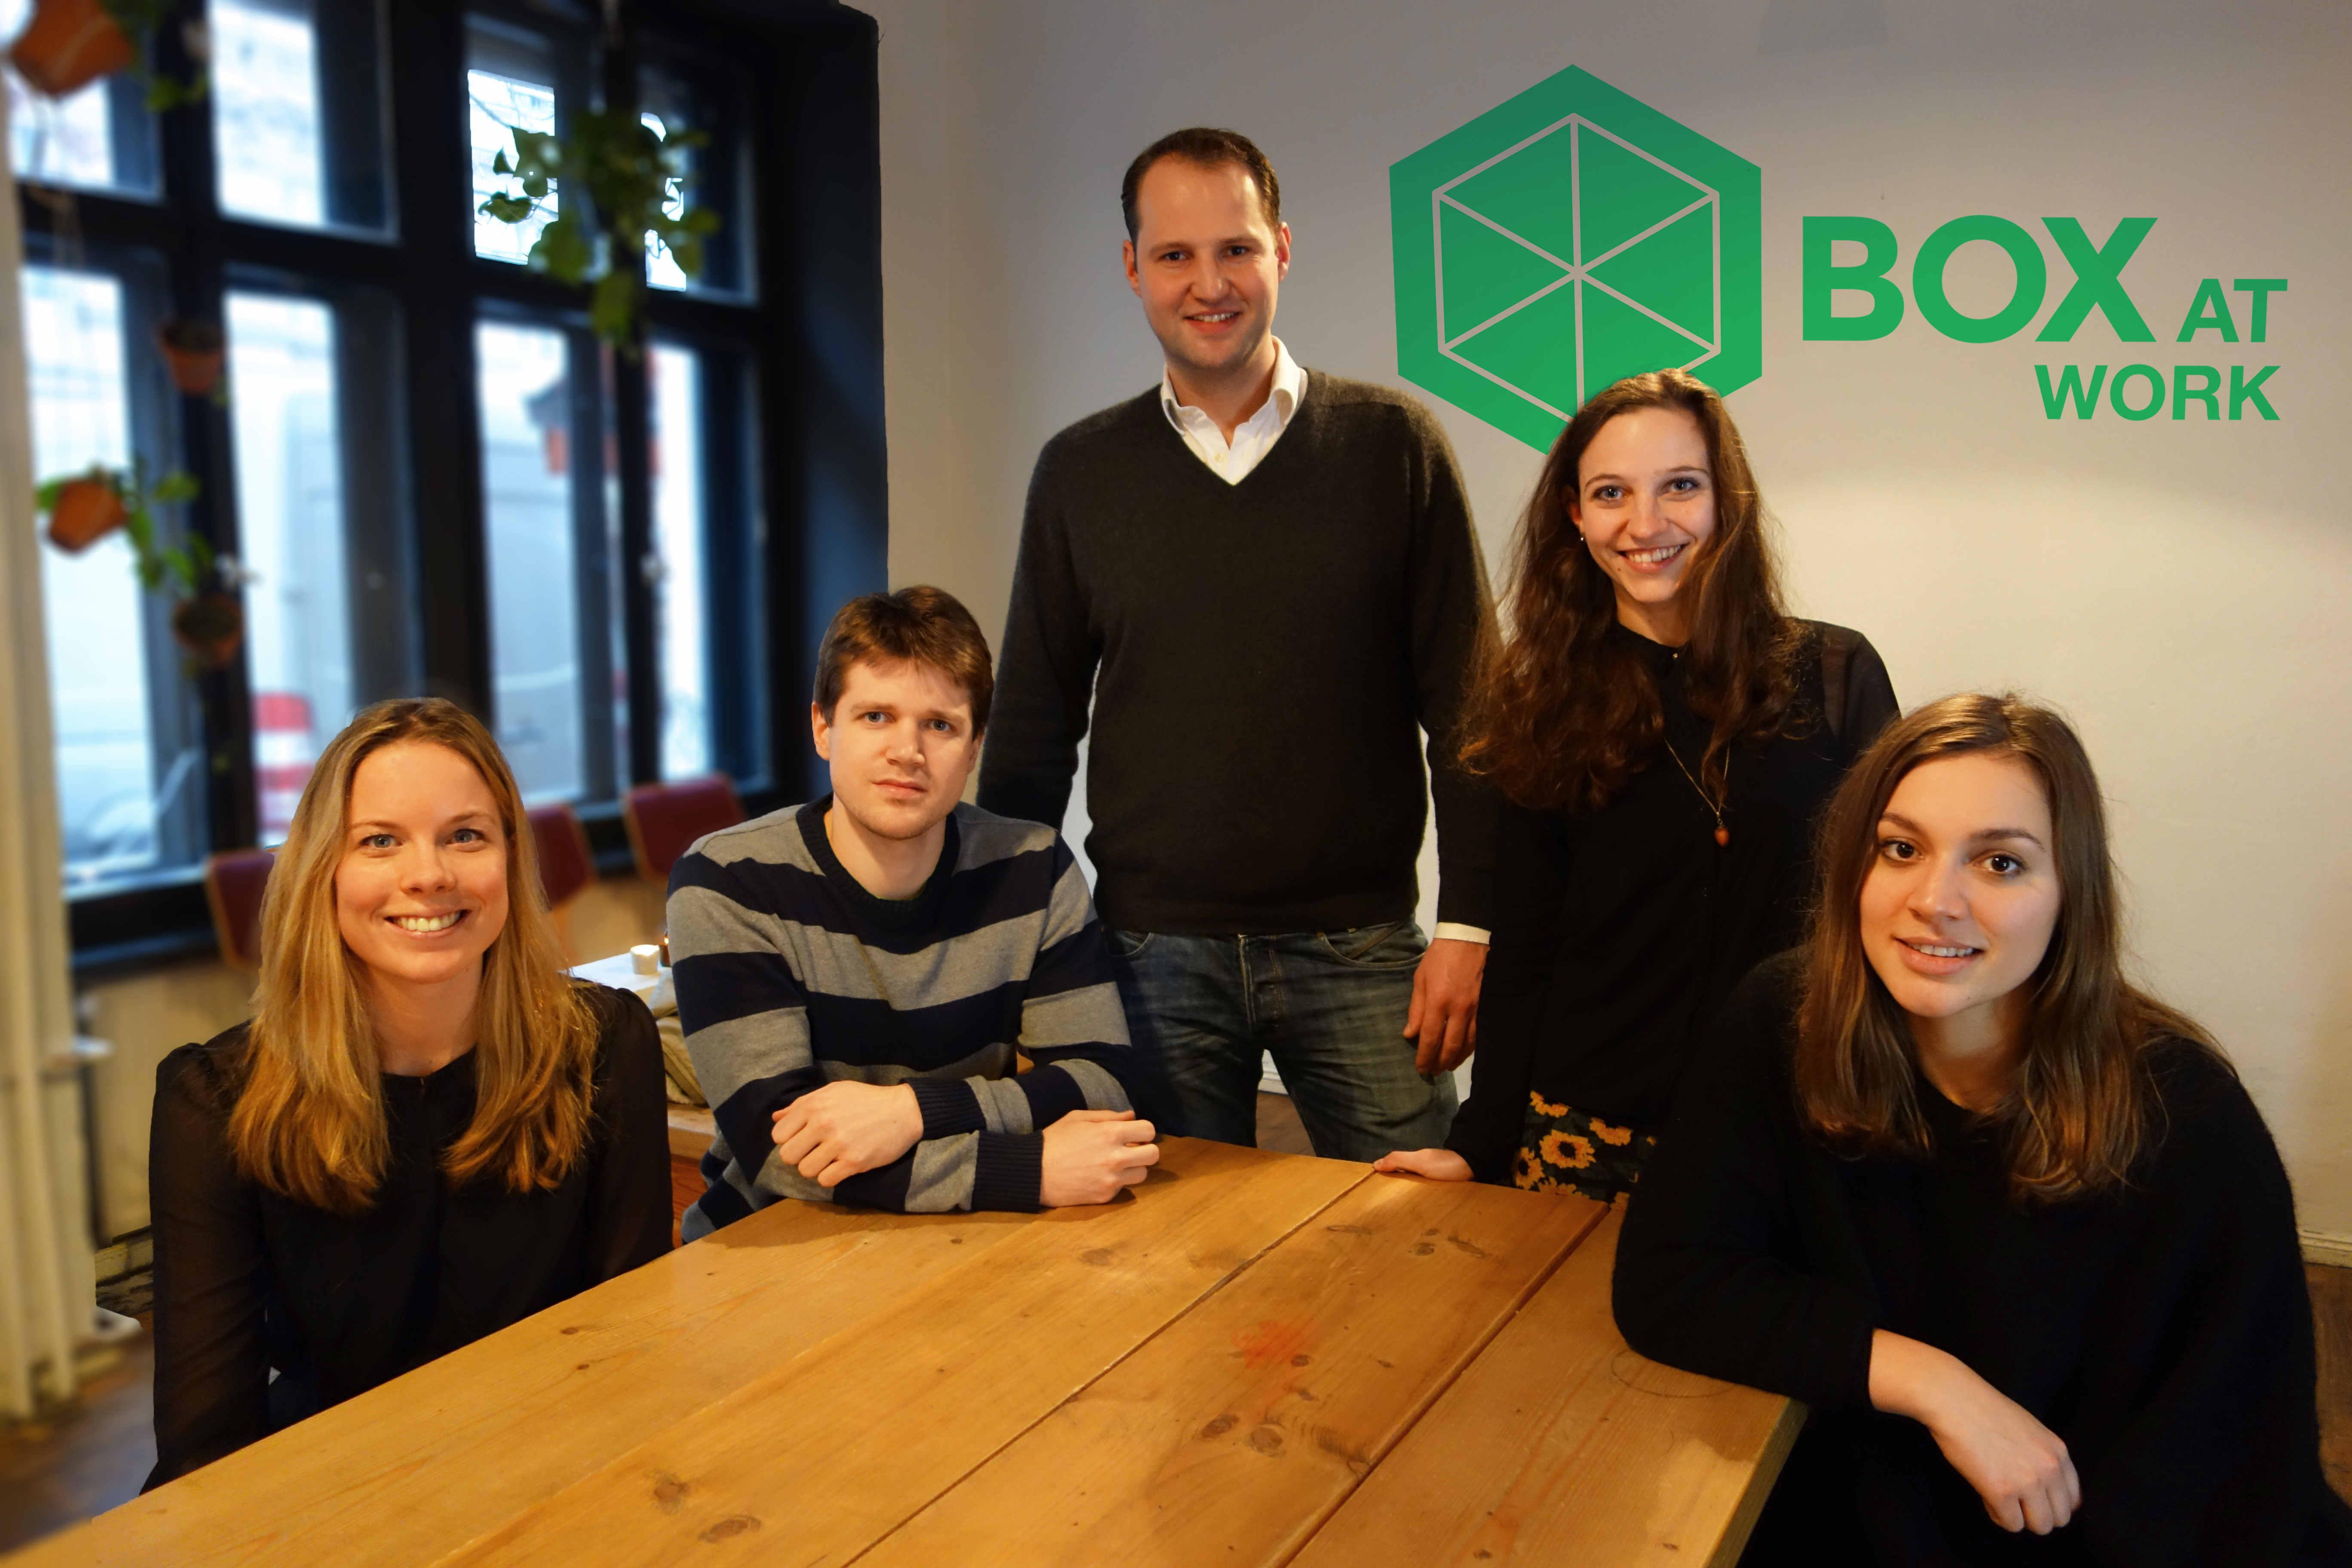 Box at Work - Shareconomy goes Umzugsbox - StartupBrett